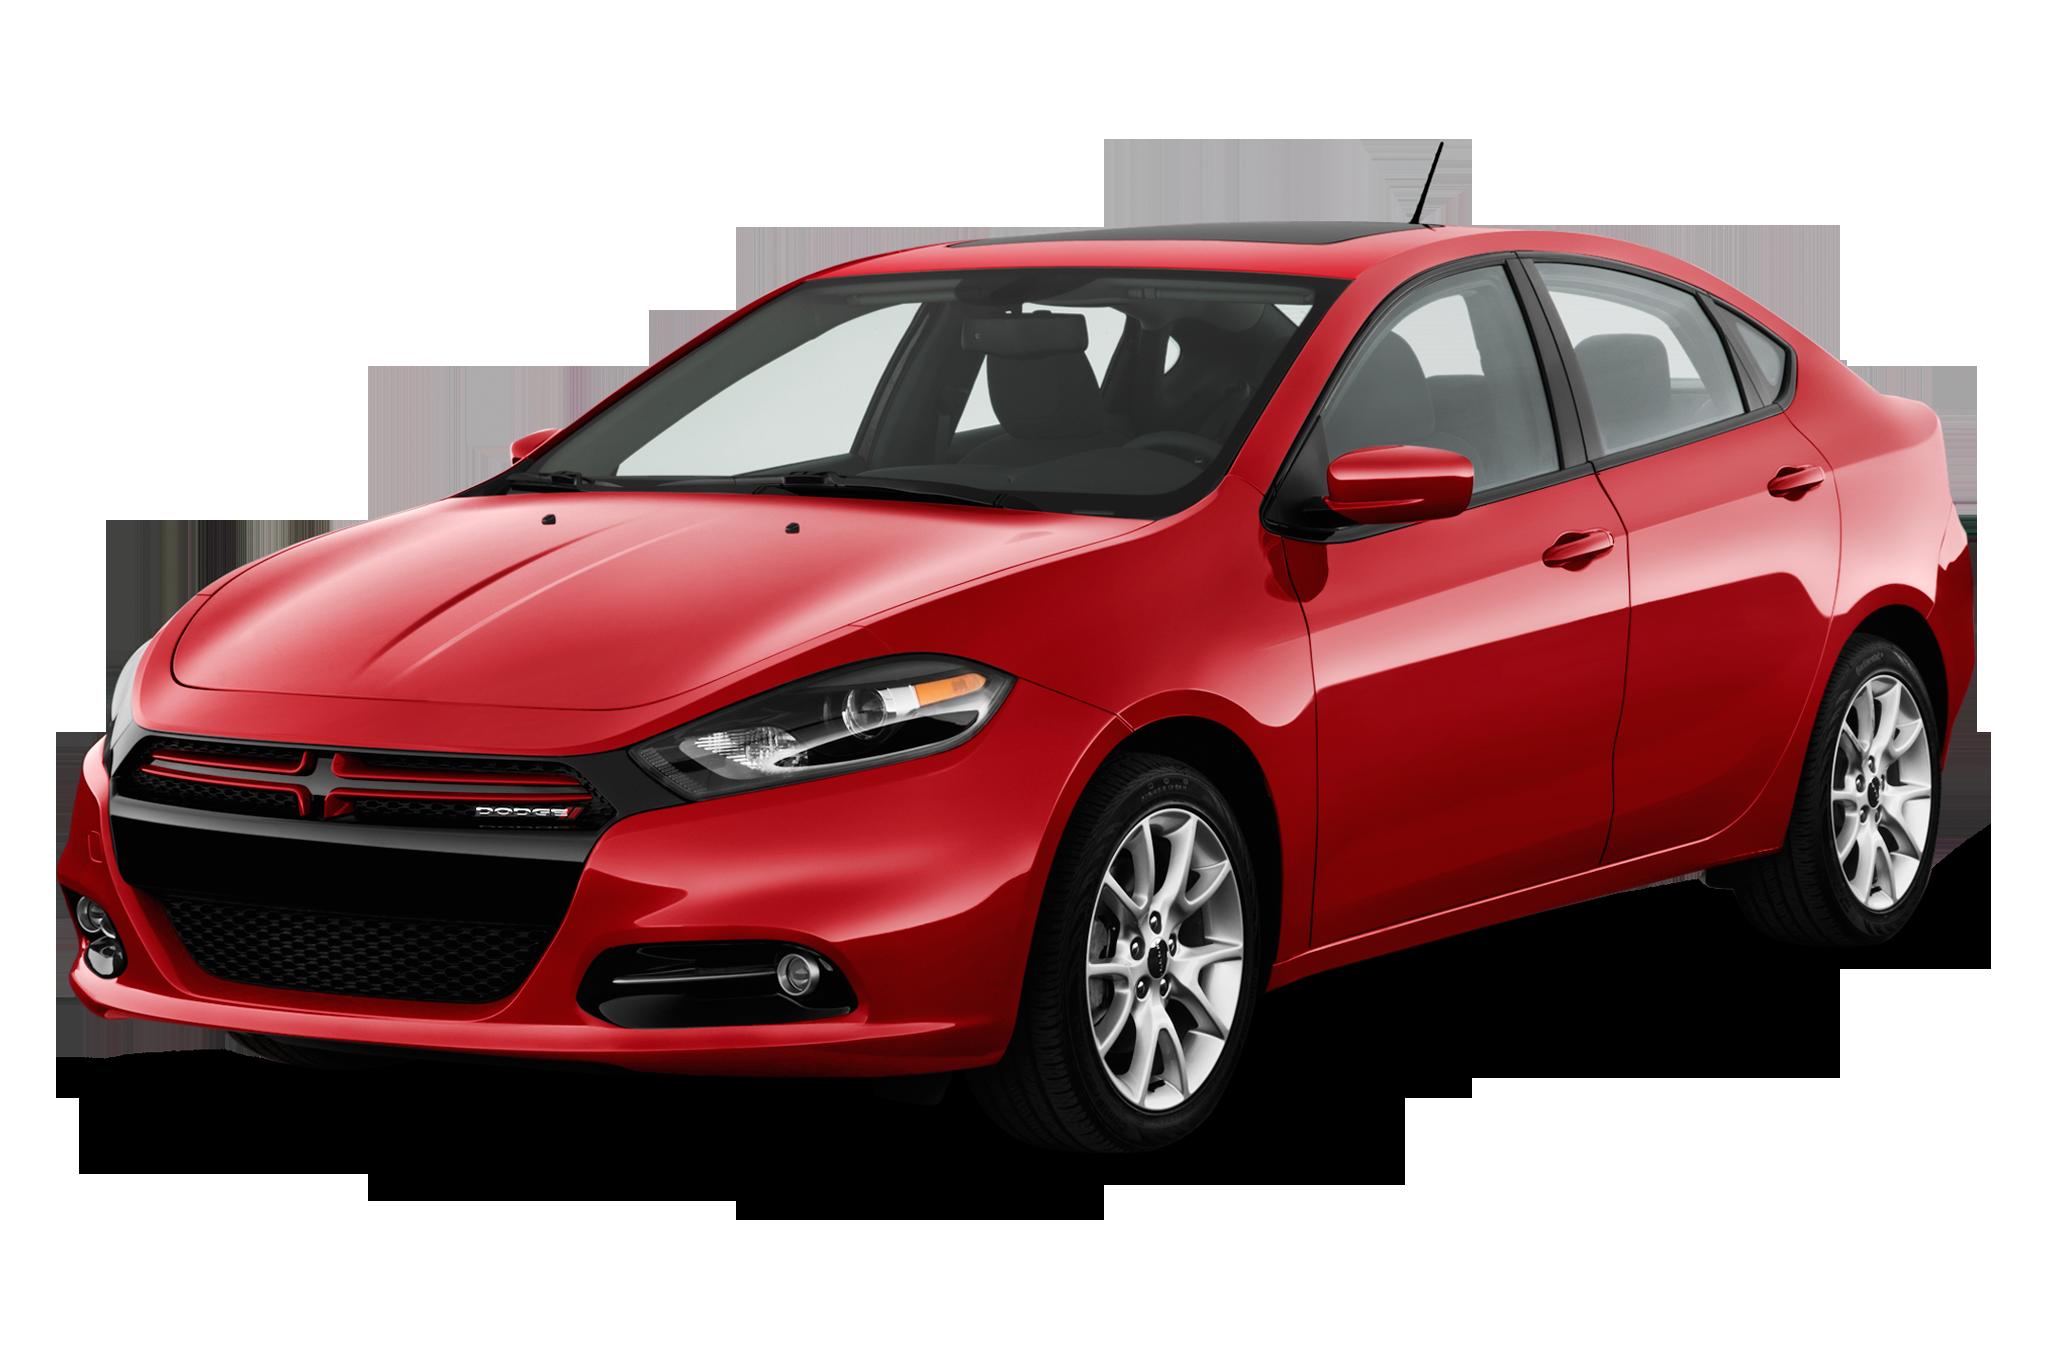 2014 Dodge Dart Blacktop Debuts for 2014 Detroit Auto Show